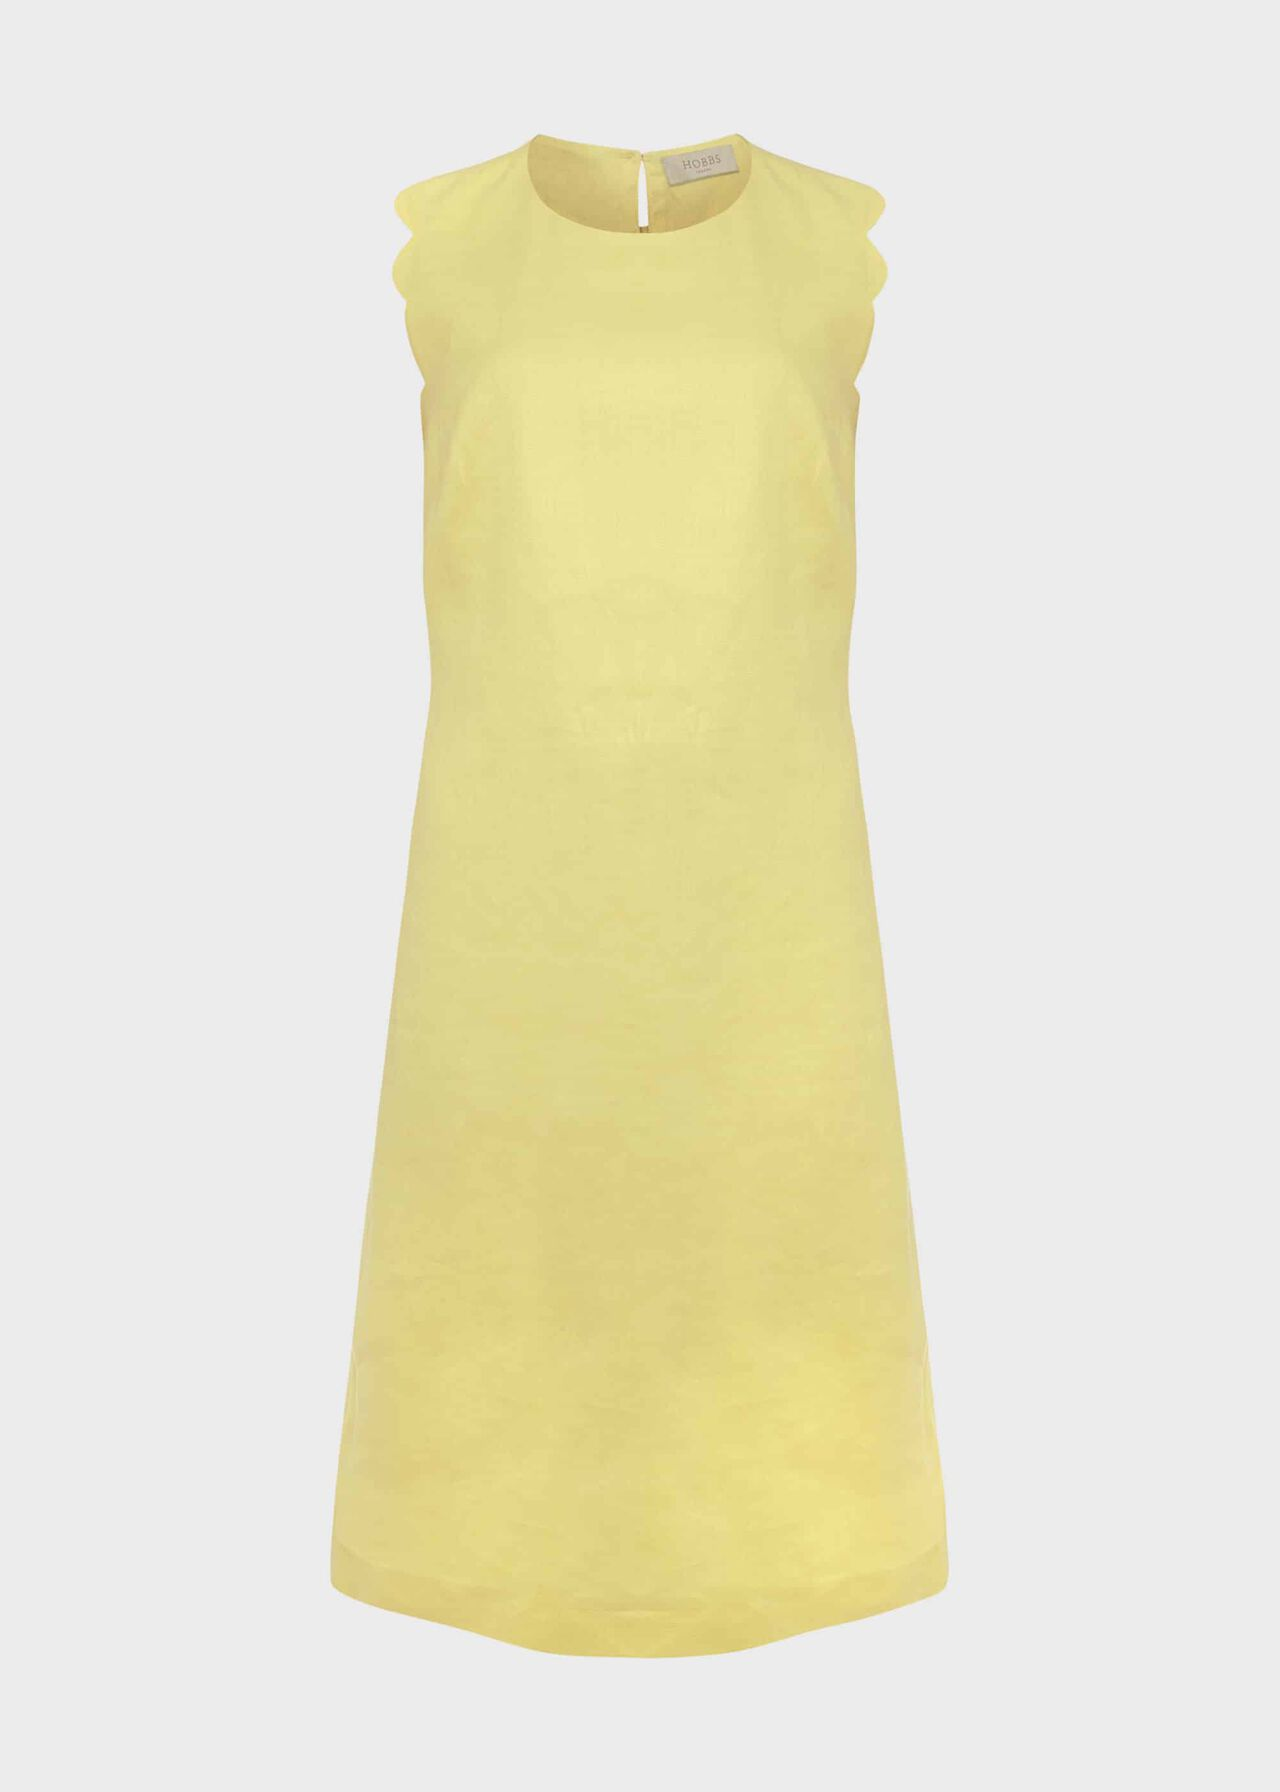 Kira Linen Shift Dress, Yellow, hi-res